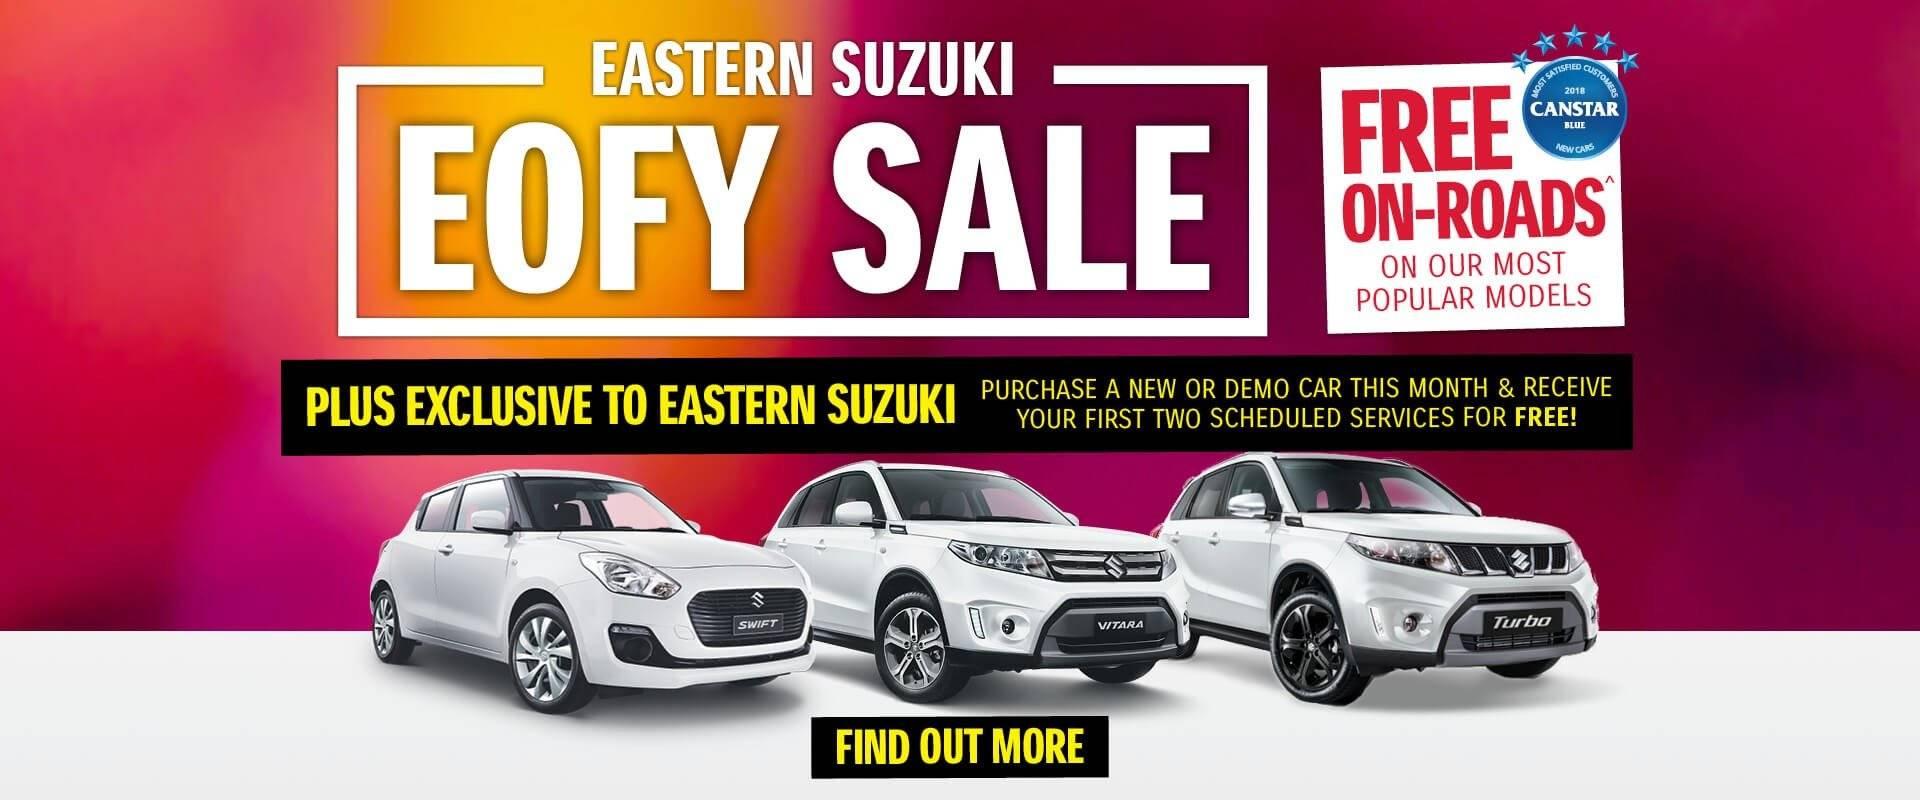 Eastern Suzuki EOFY Sale